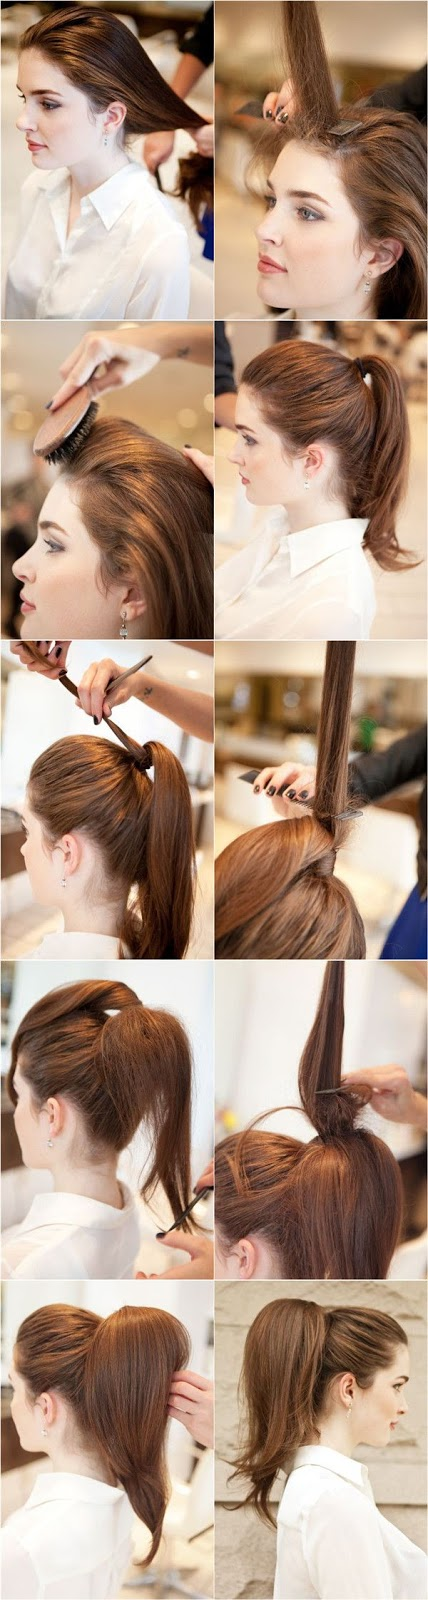 How To Make A Big Full Ponytail Tutorial Hair Nail Pinterest